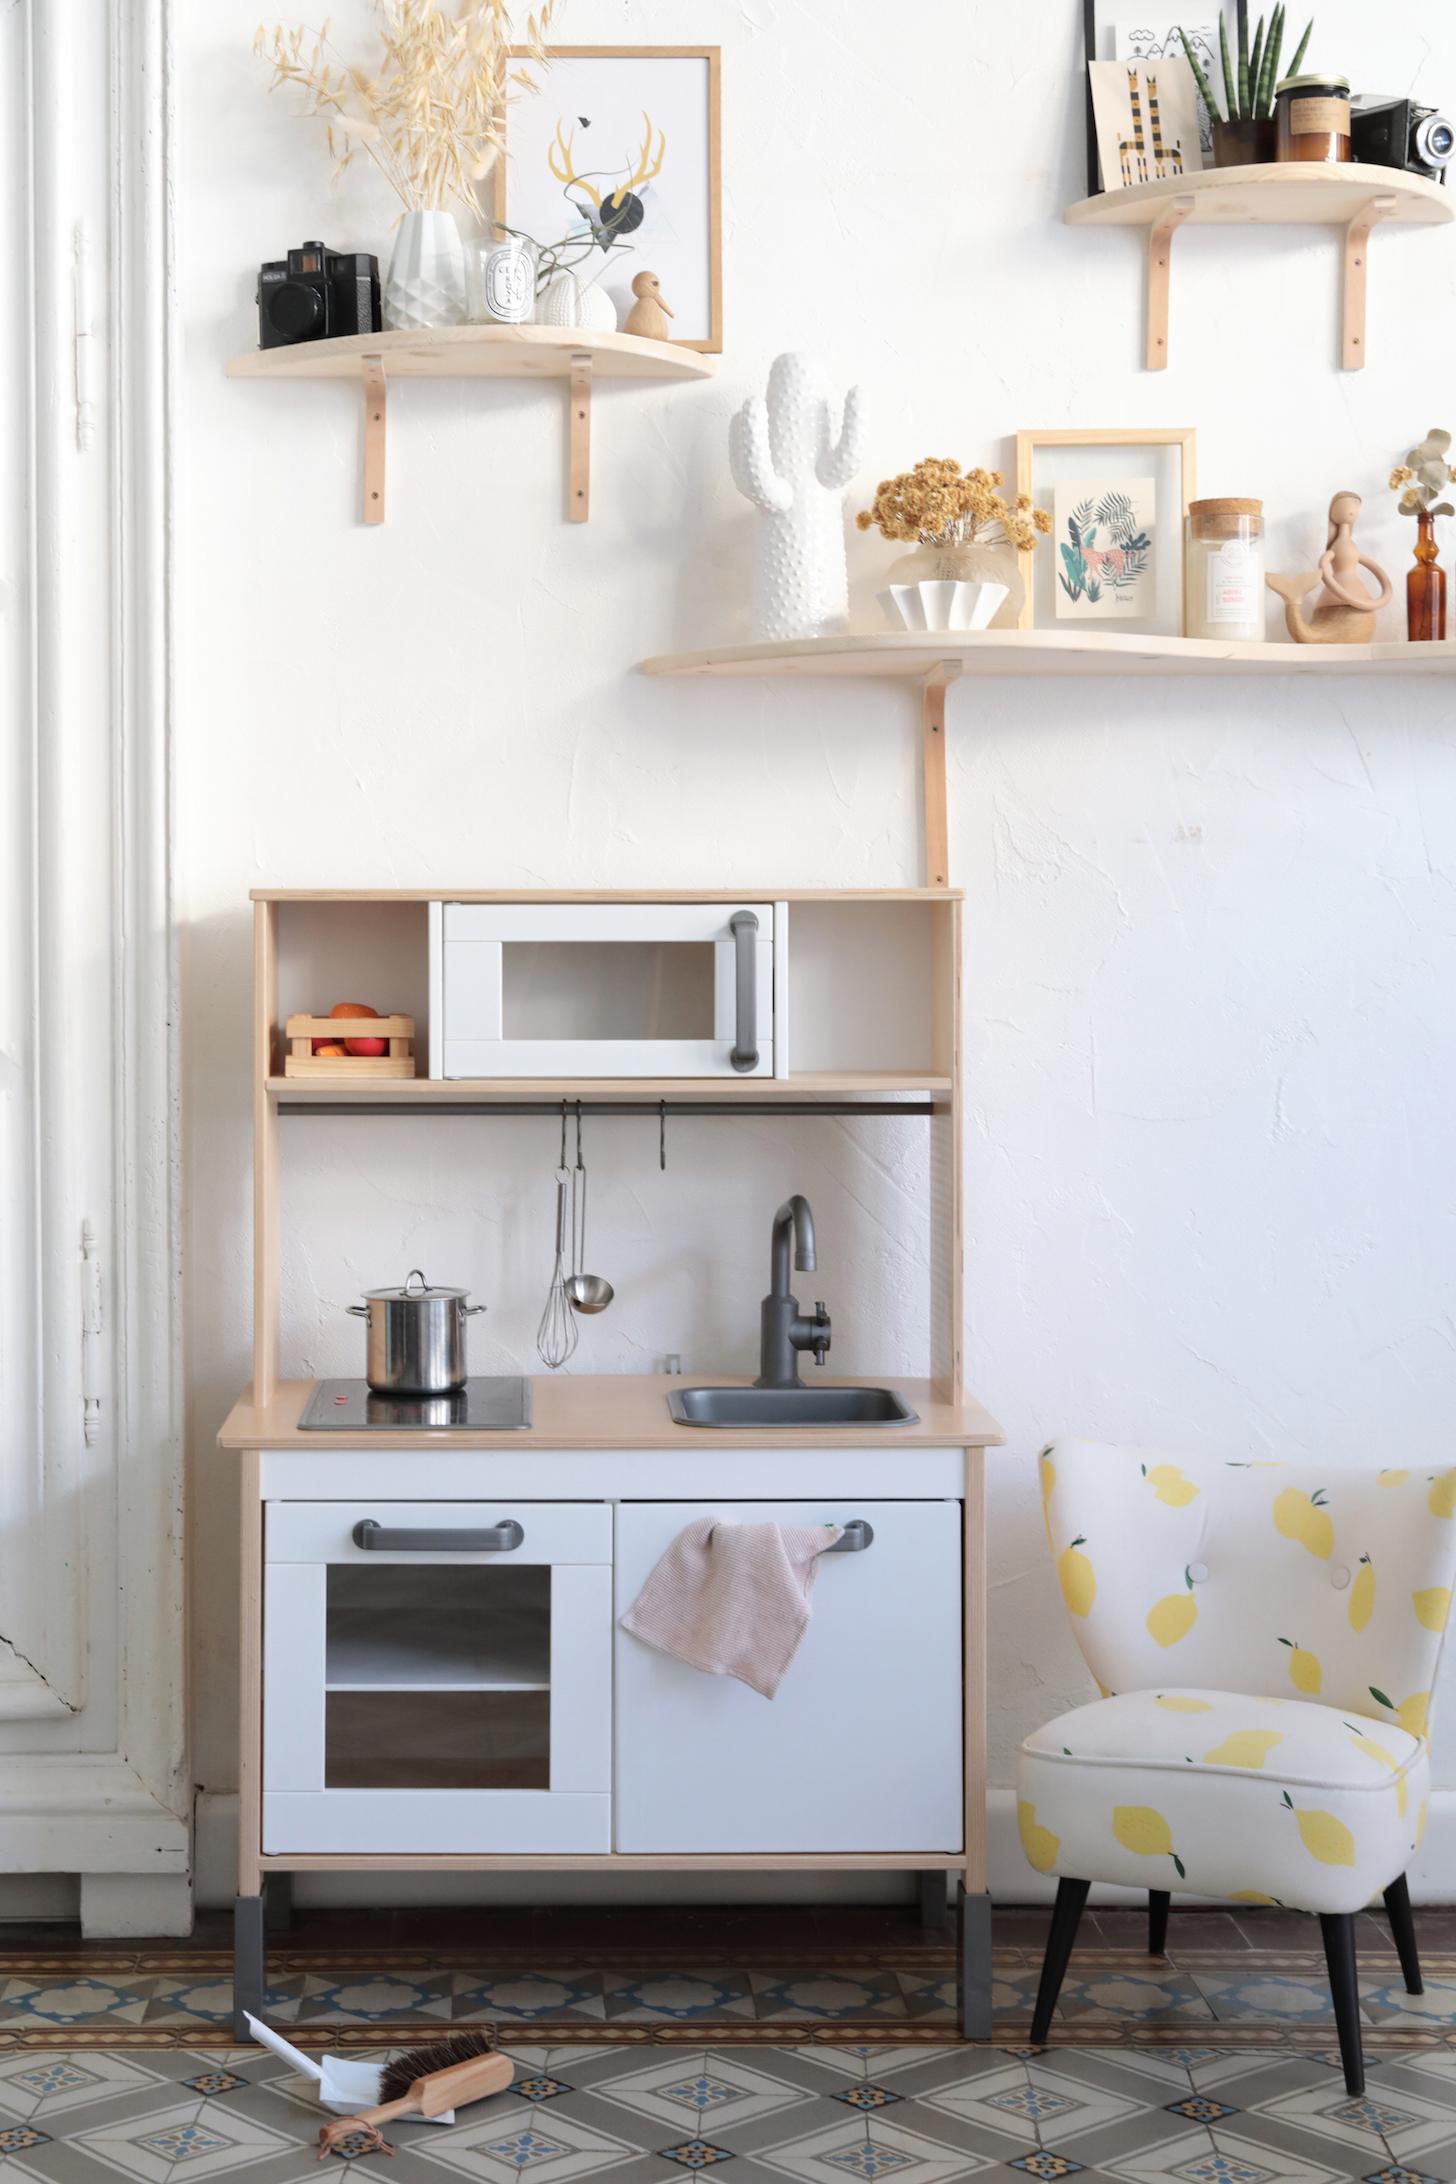 ikea hack comment relooker la cuisine pour enfant duktig. Black Bedroom Furniture Sets. Home Design Ideas